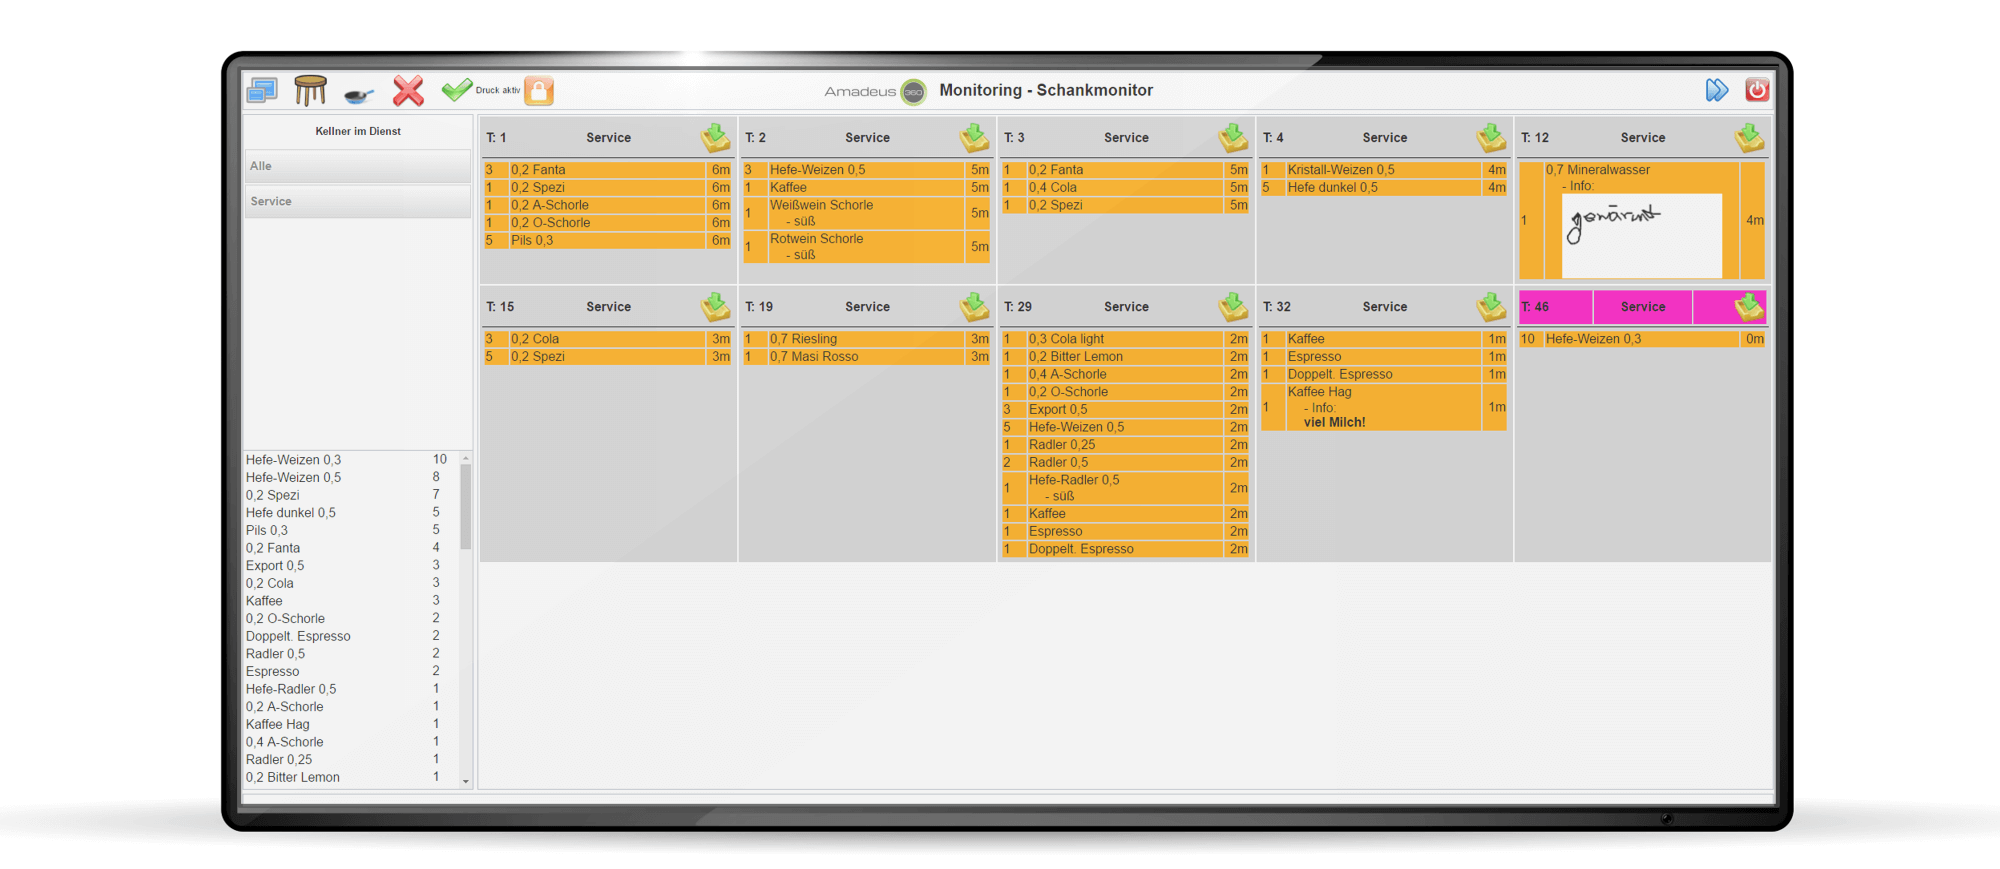 Amadeus Monitoring Schankmonitor